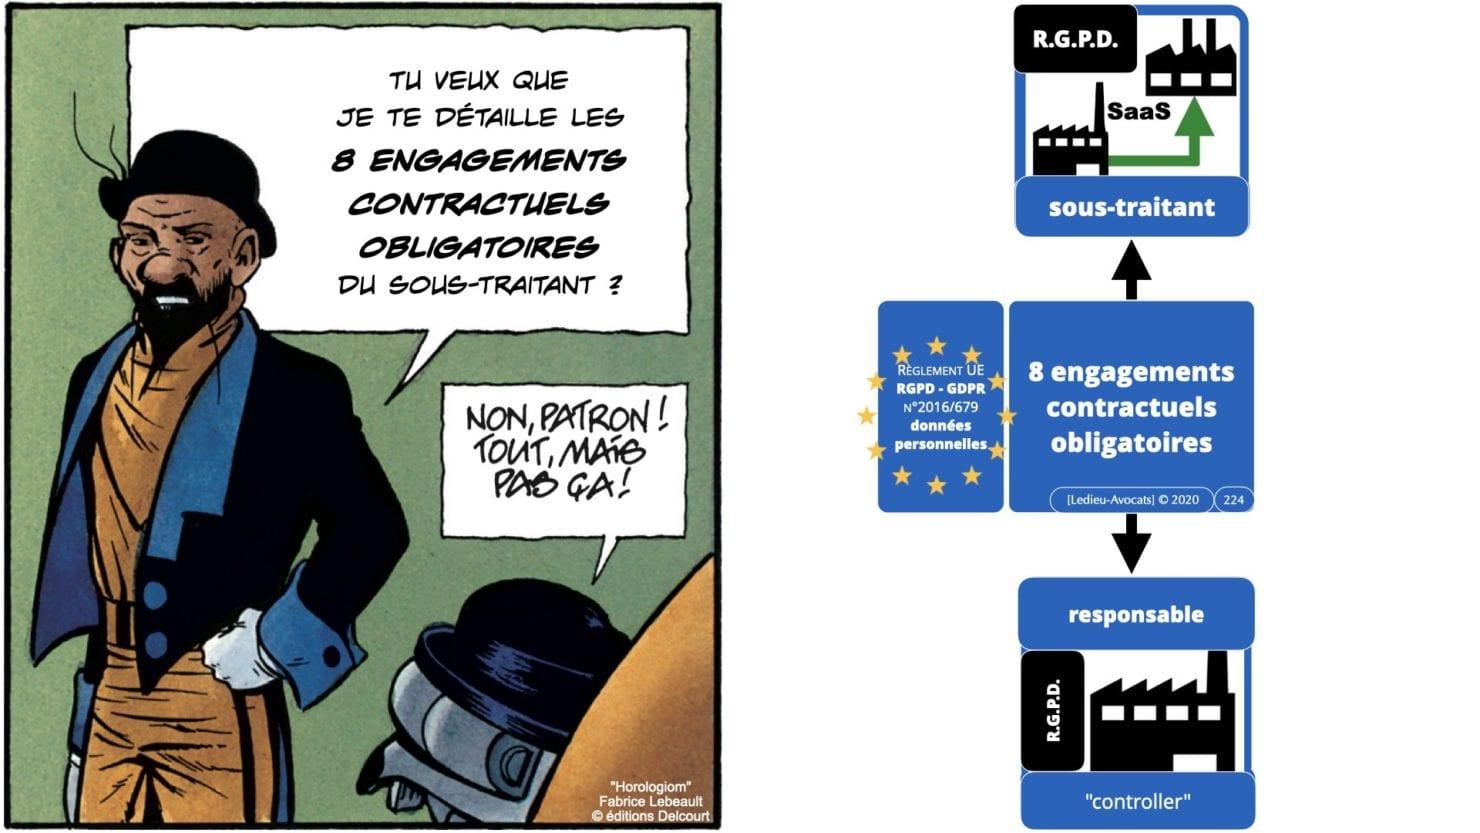 RGPD e-Privacy principes actualité jurisprudence ©Ledieu-Avocats 25-06-2021.224